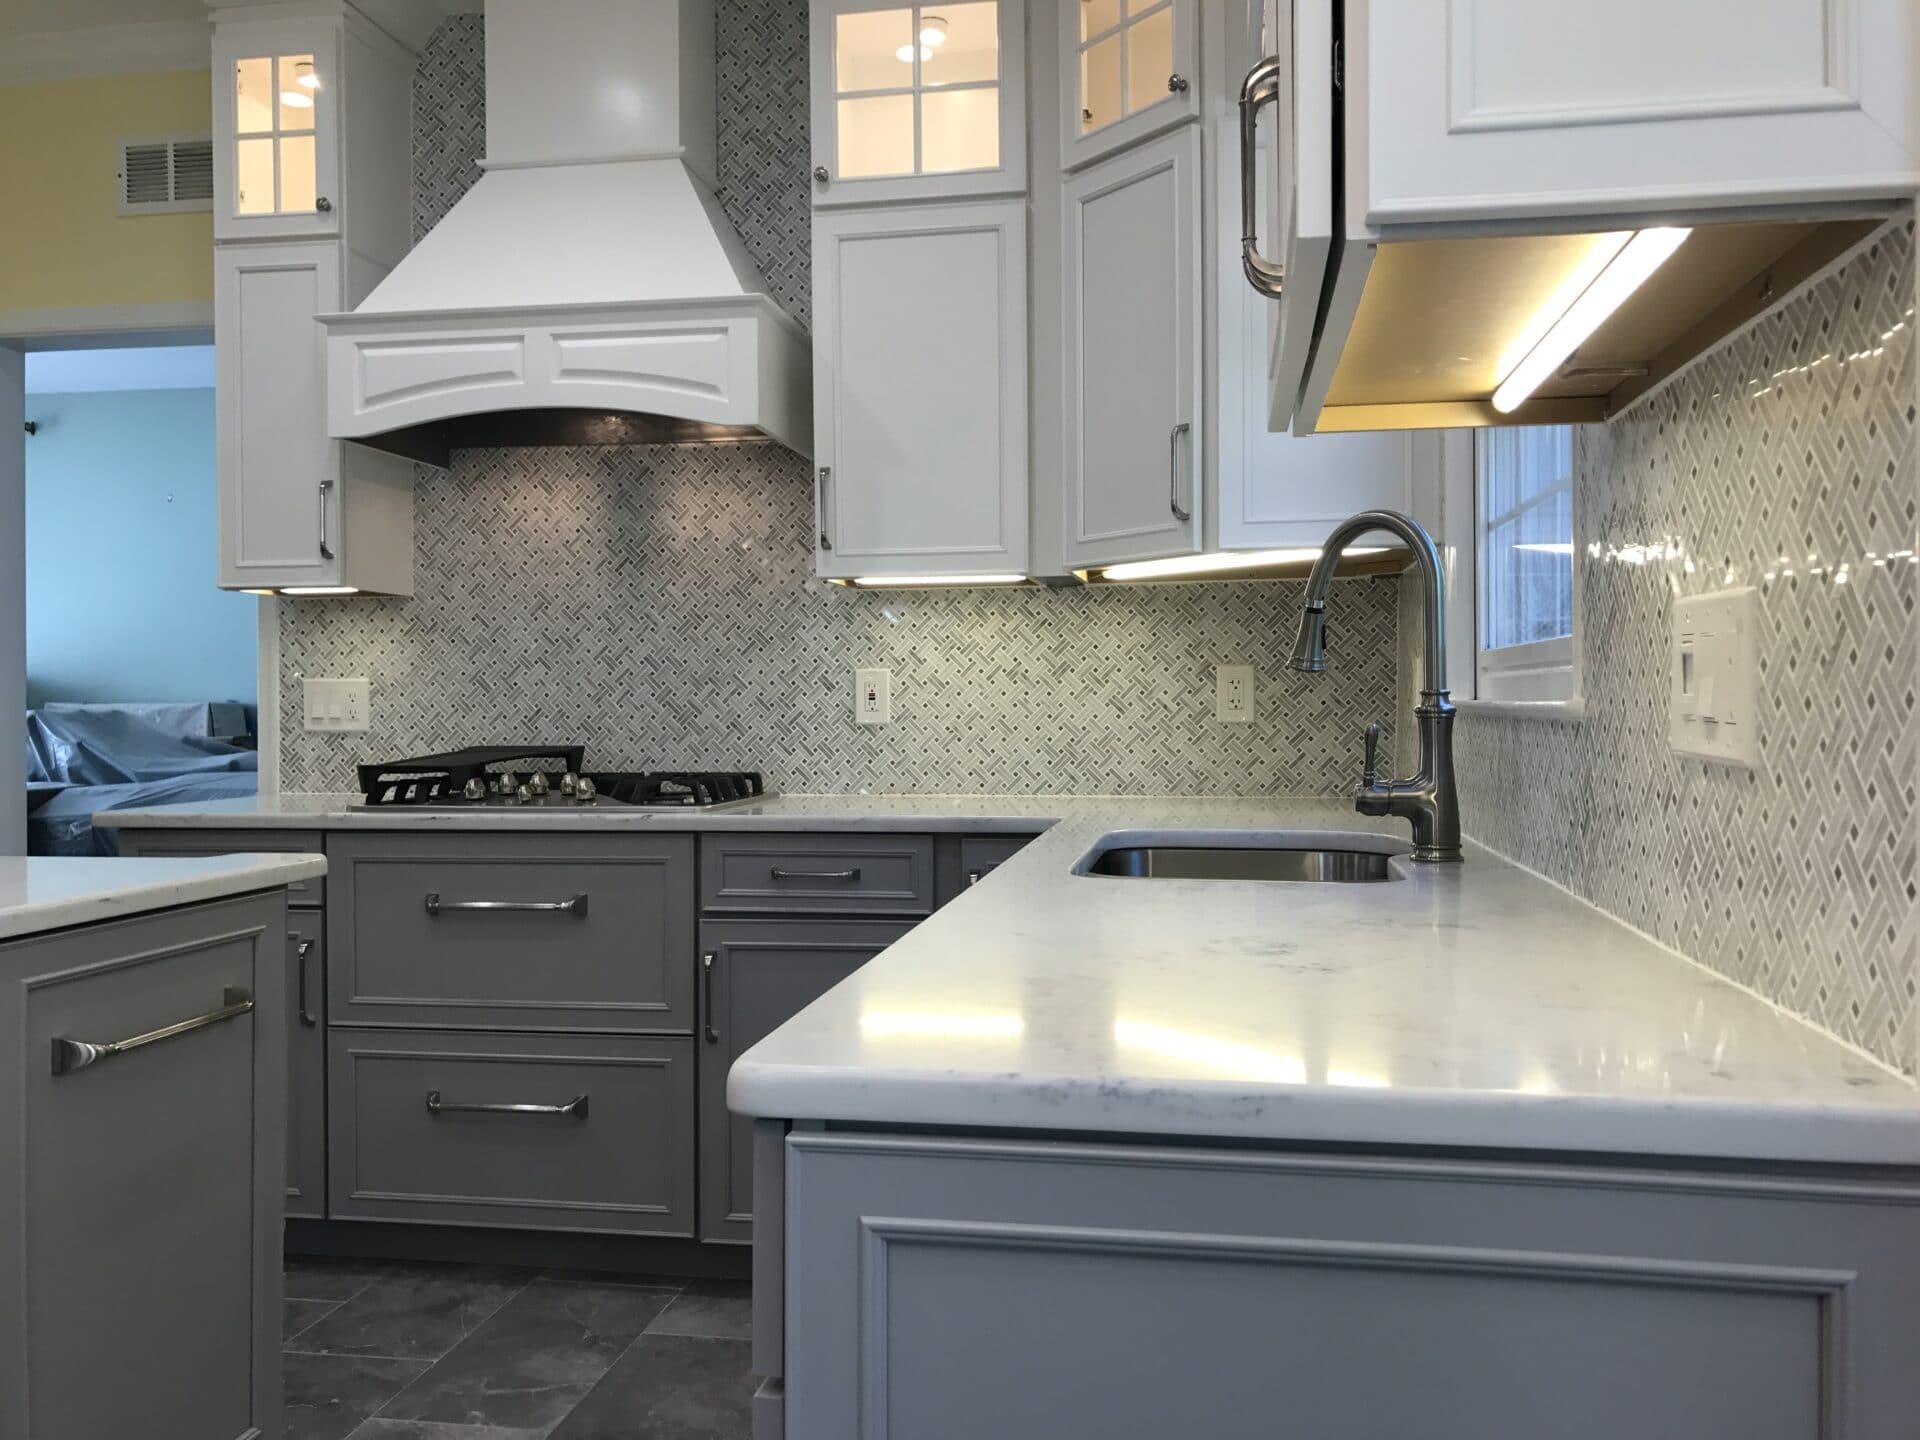 IMG 7717 kitchen